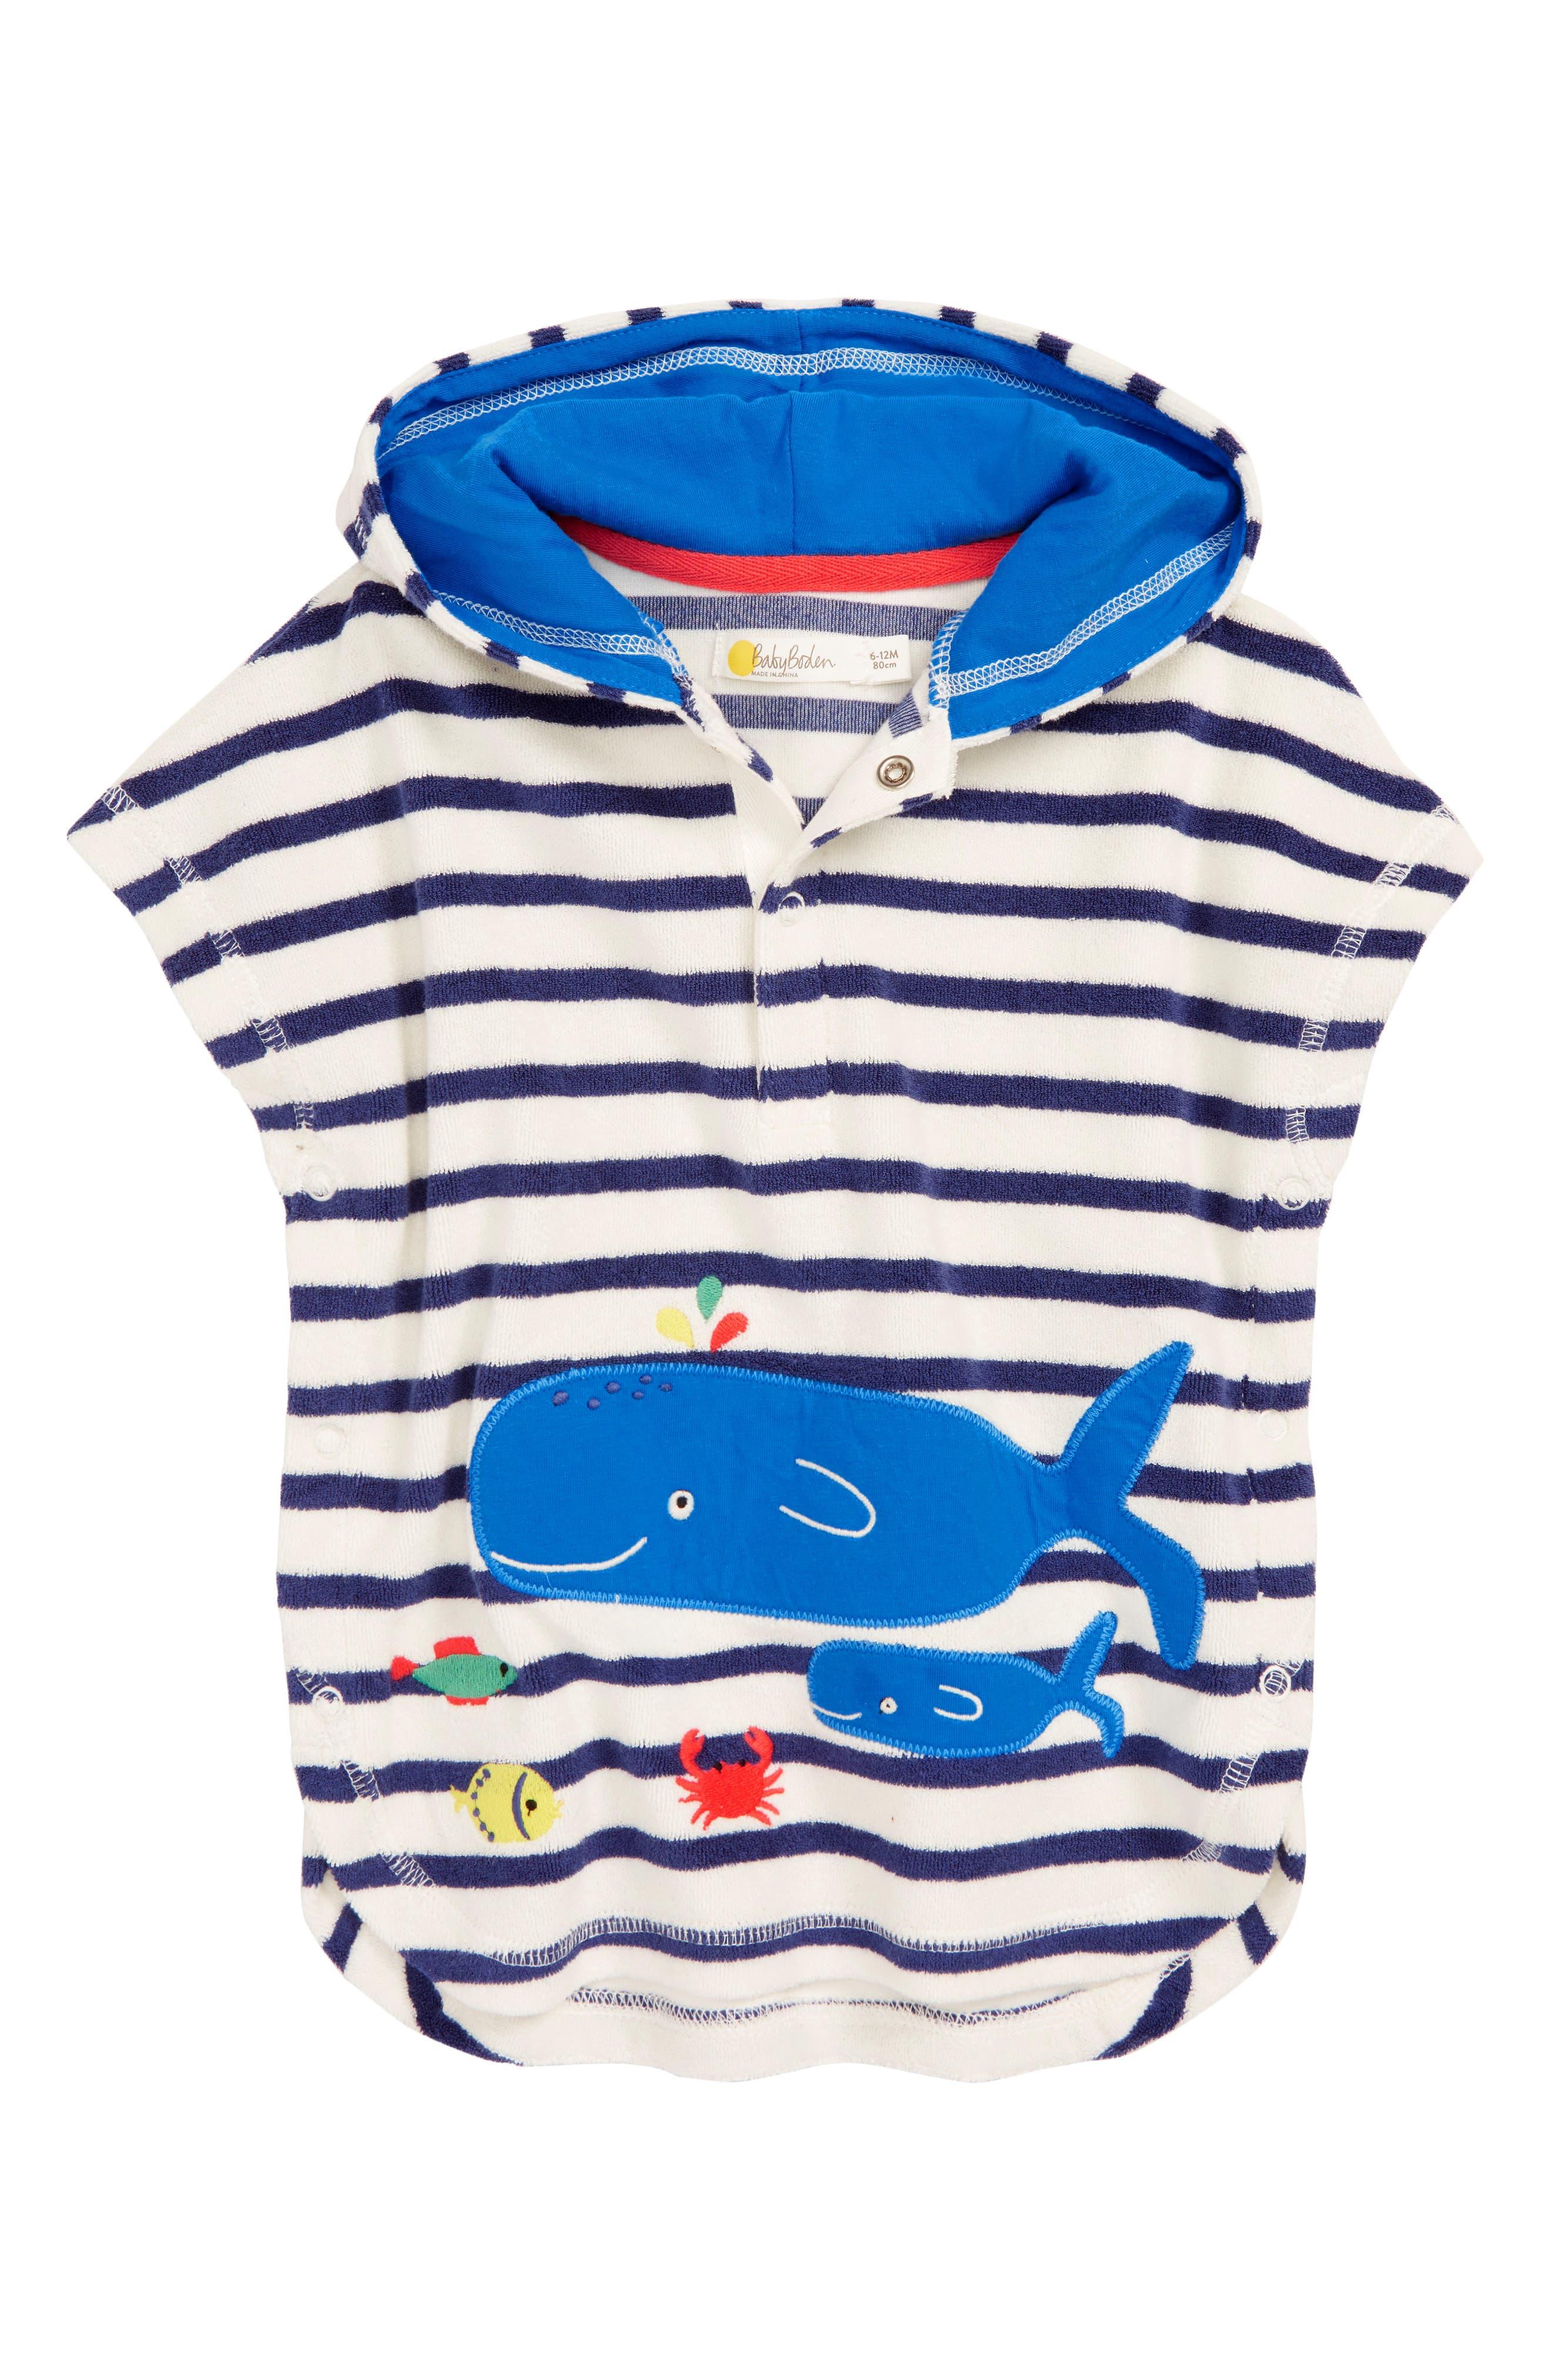 82b28de740d651 Mini Boden Baby Clothing